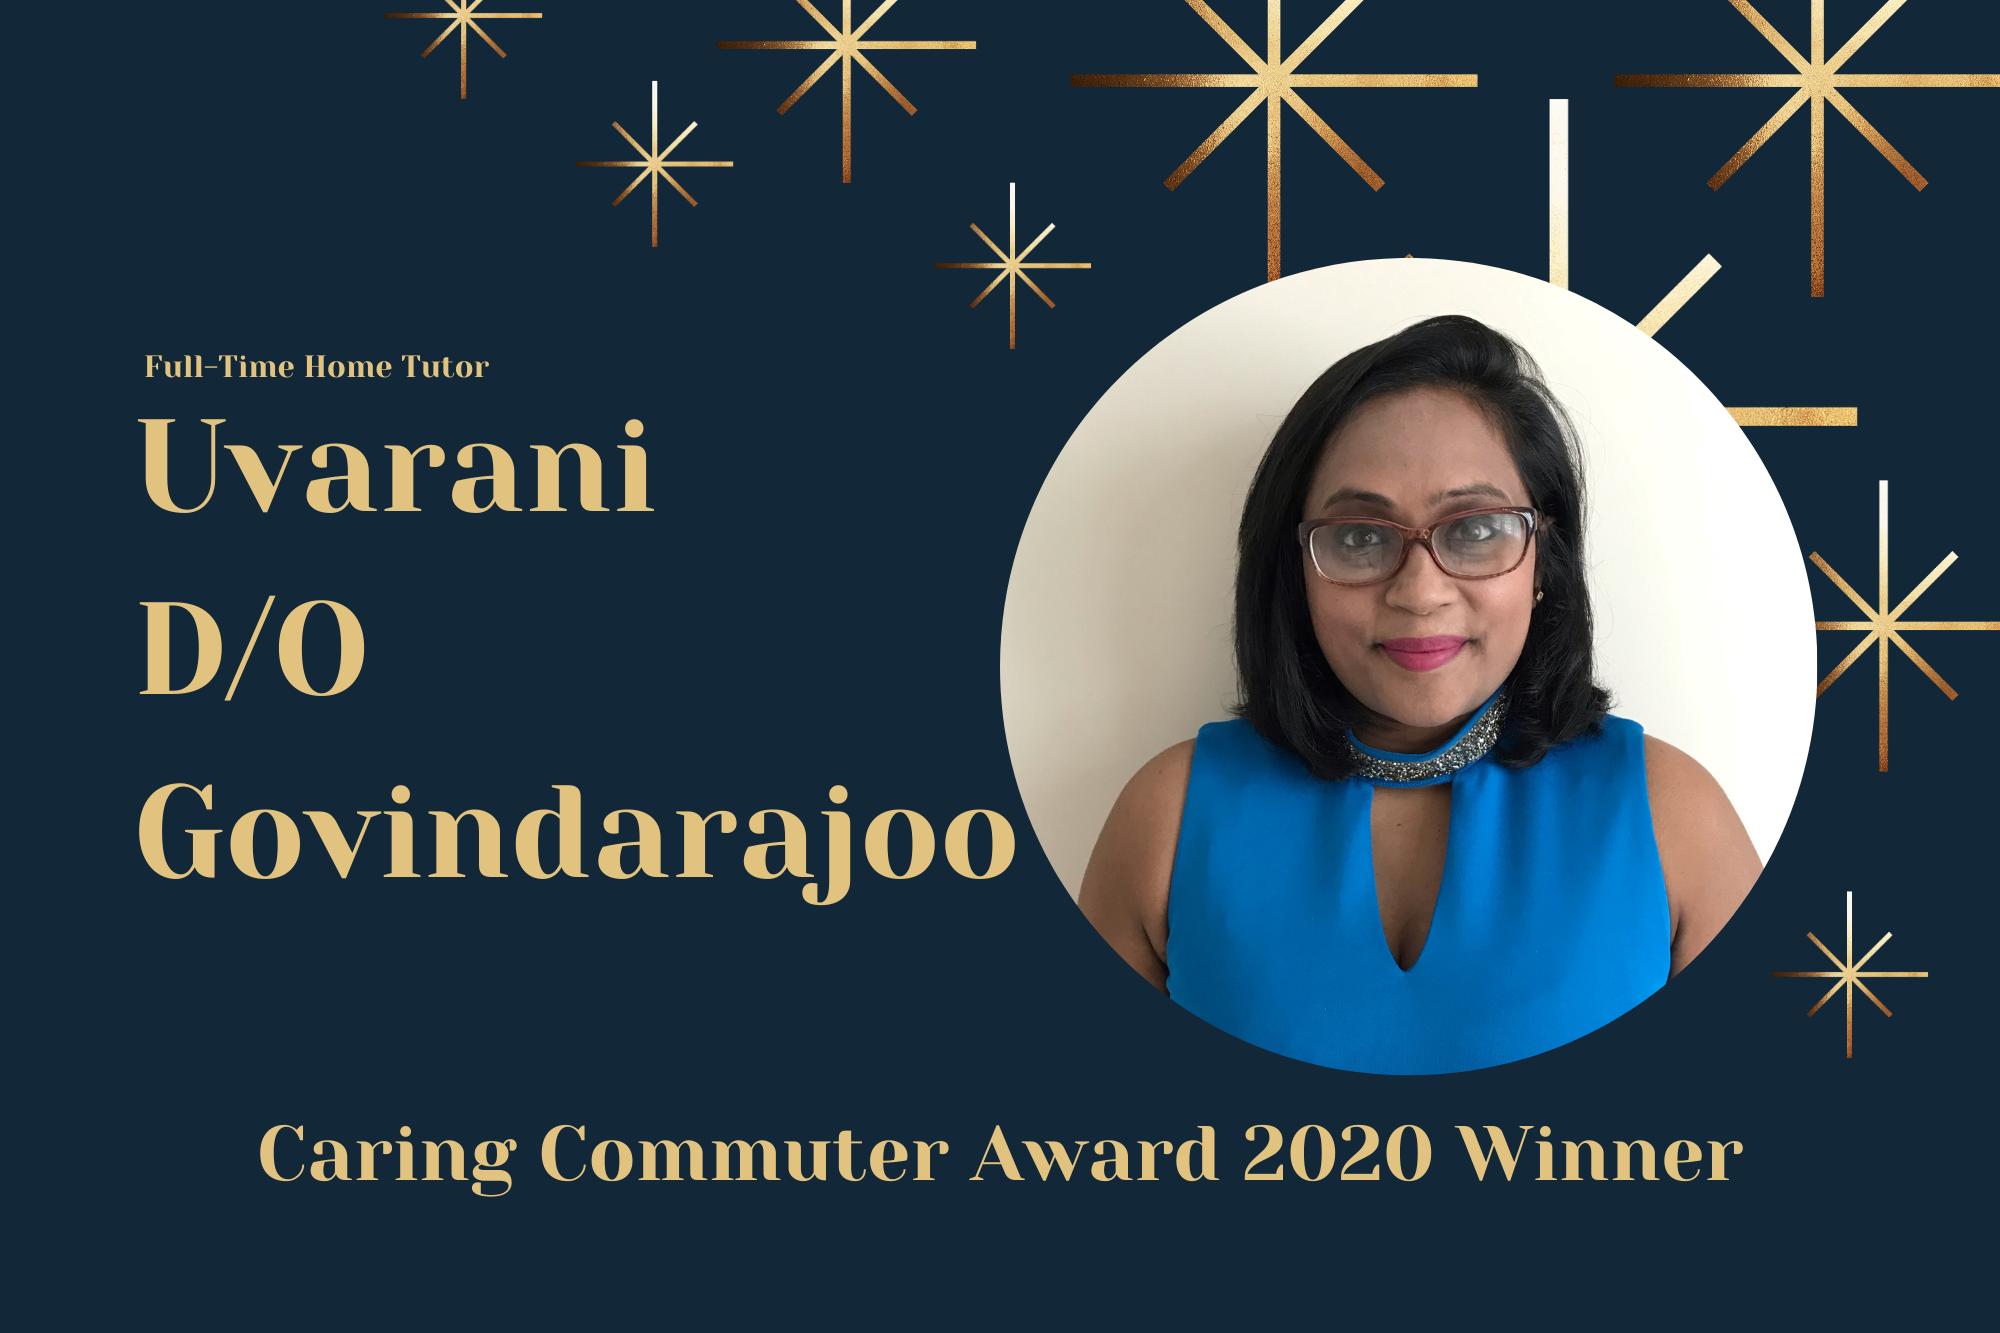 Meet Uvarani, Full-Time Home Tutor and Caring Commuter Award 2020 Winner